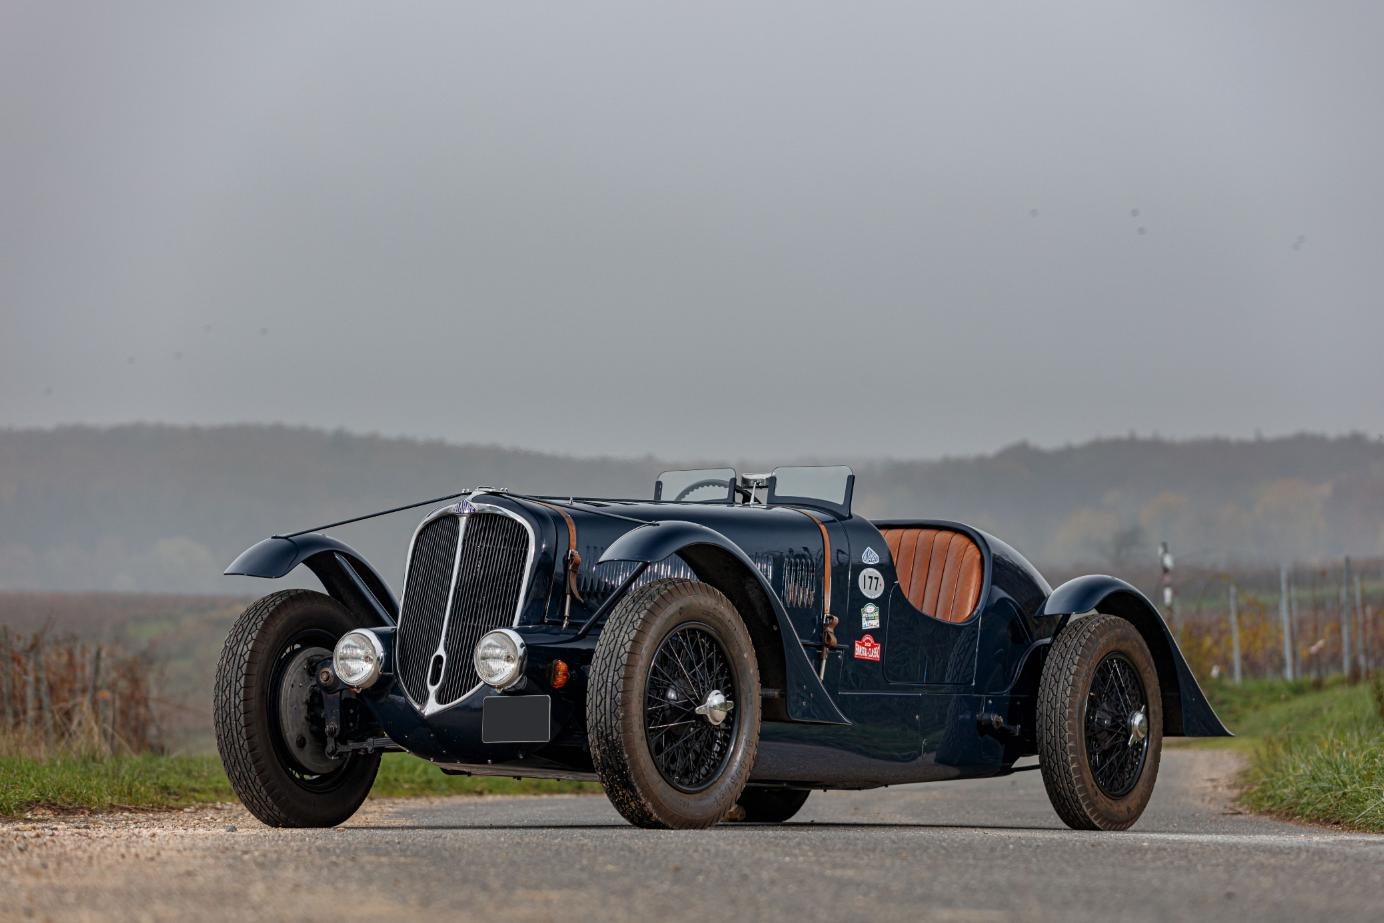 1936 Delahaye 135 Spécial roadster